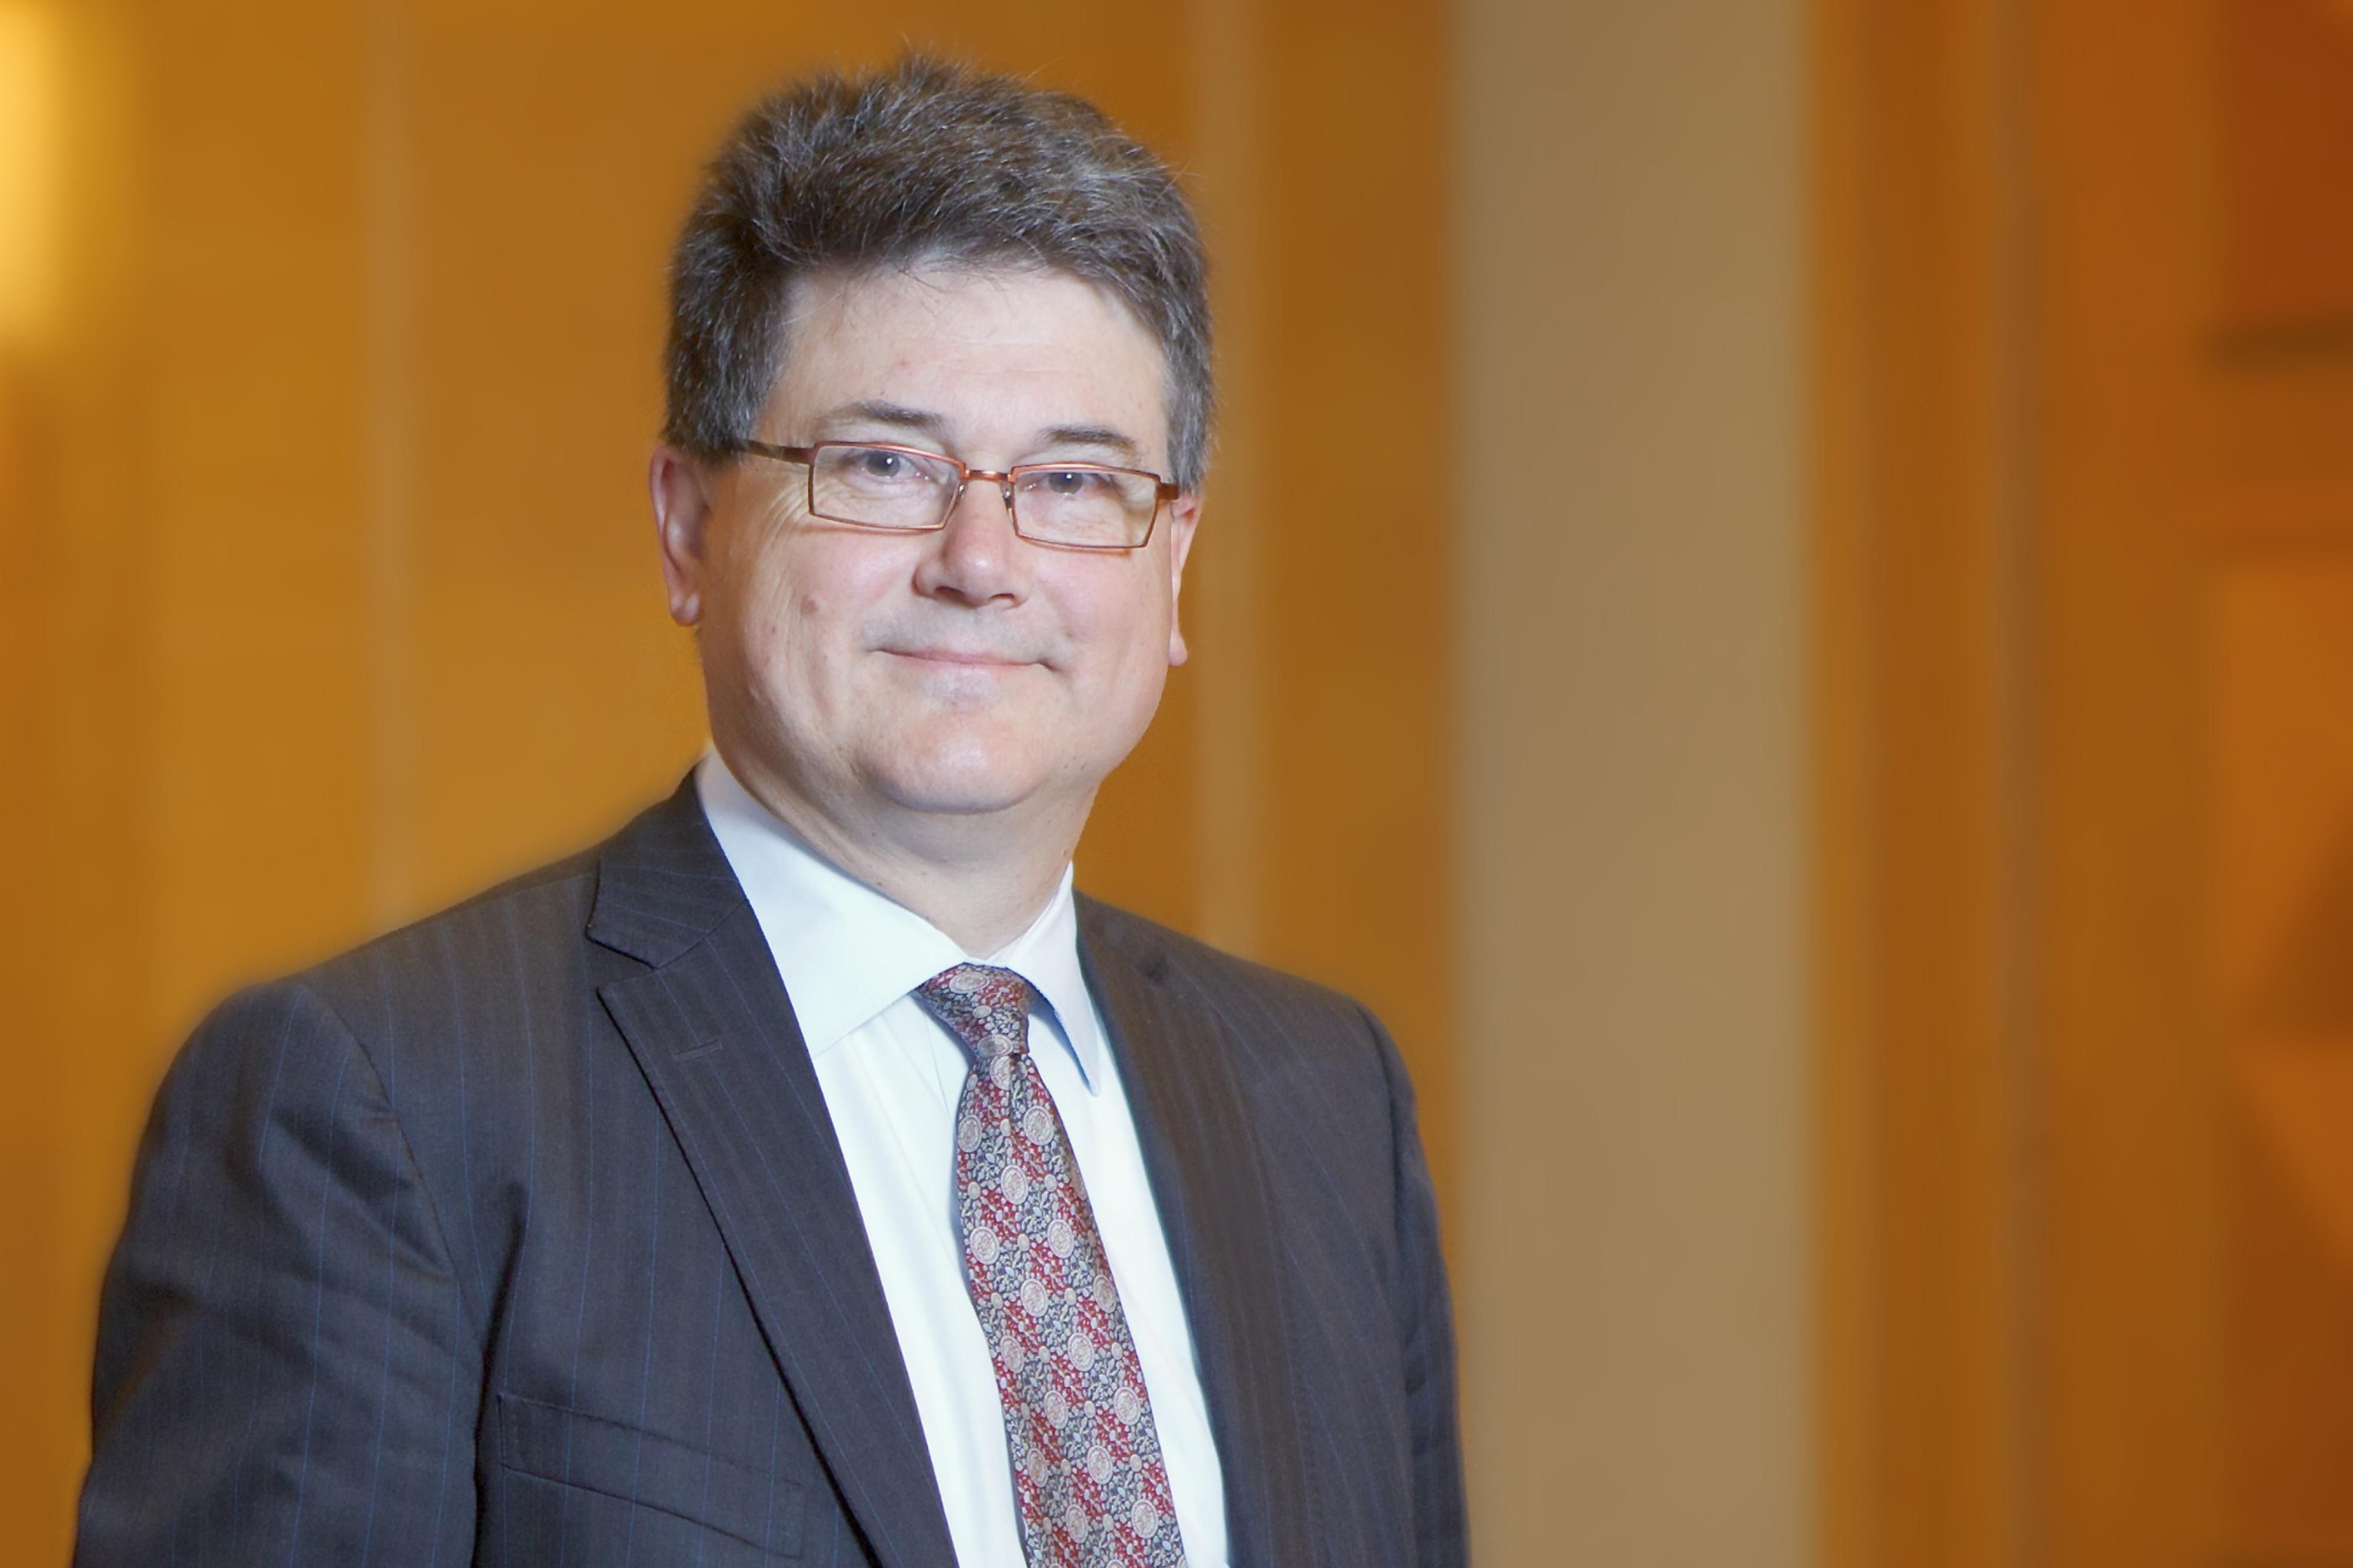 Dadelszen receives 17 million in funding